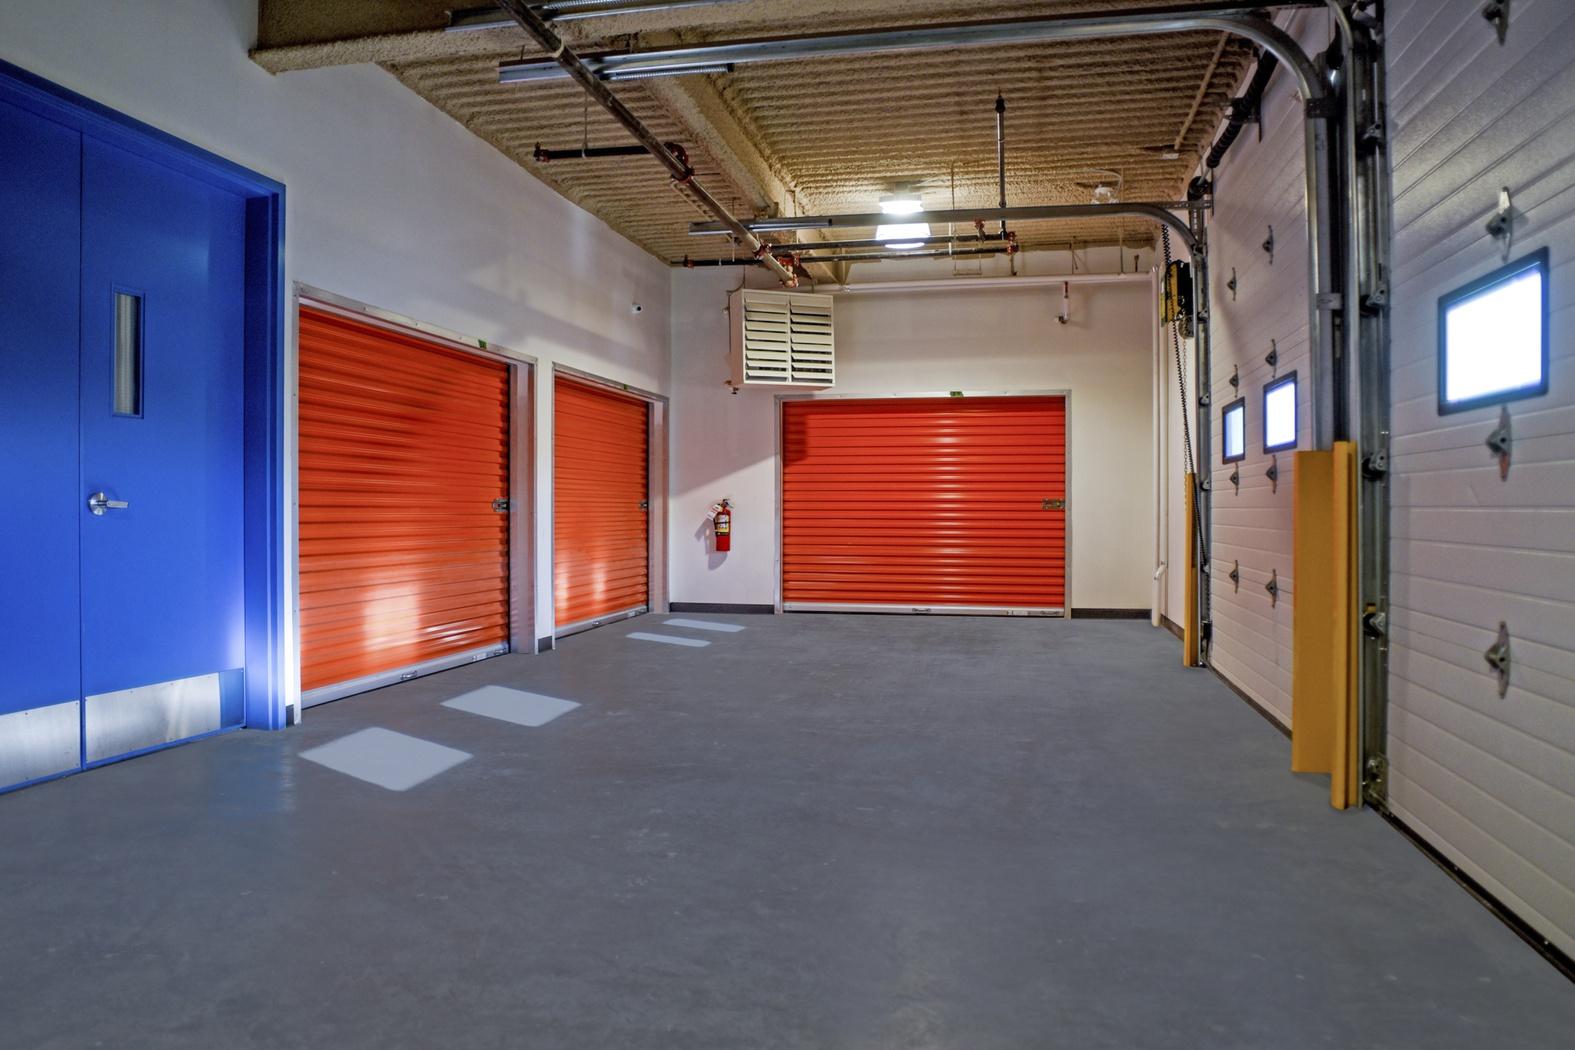 calgary west storage units access self storage. Black Bedroom Furniture Sets. Home Design Ideas